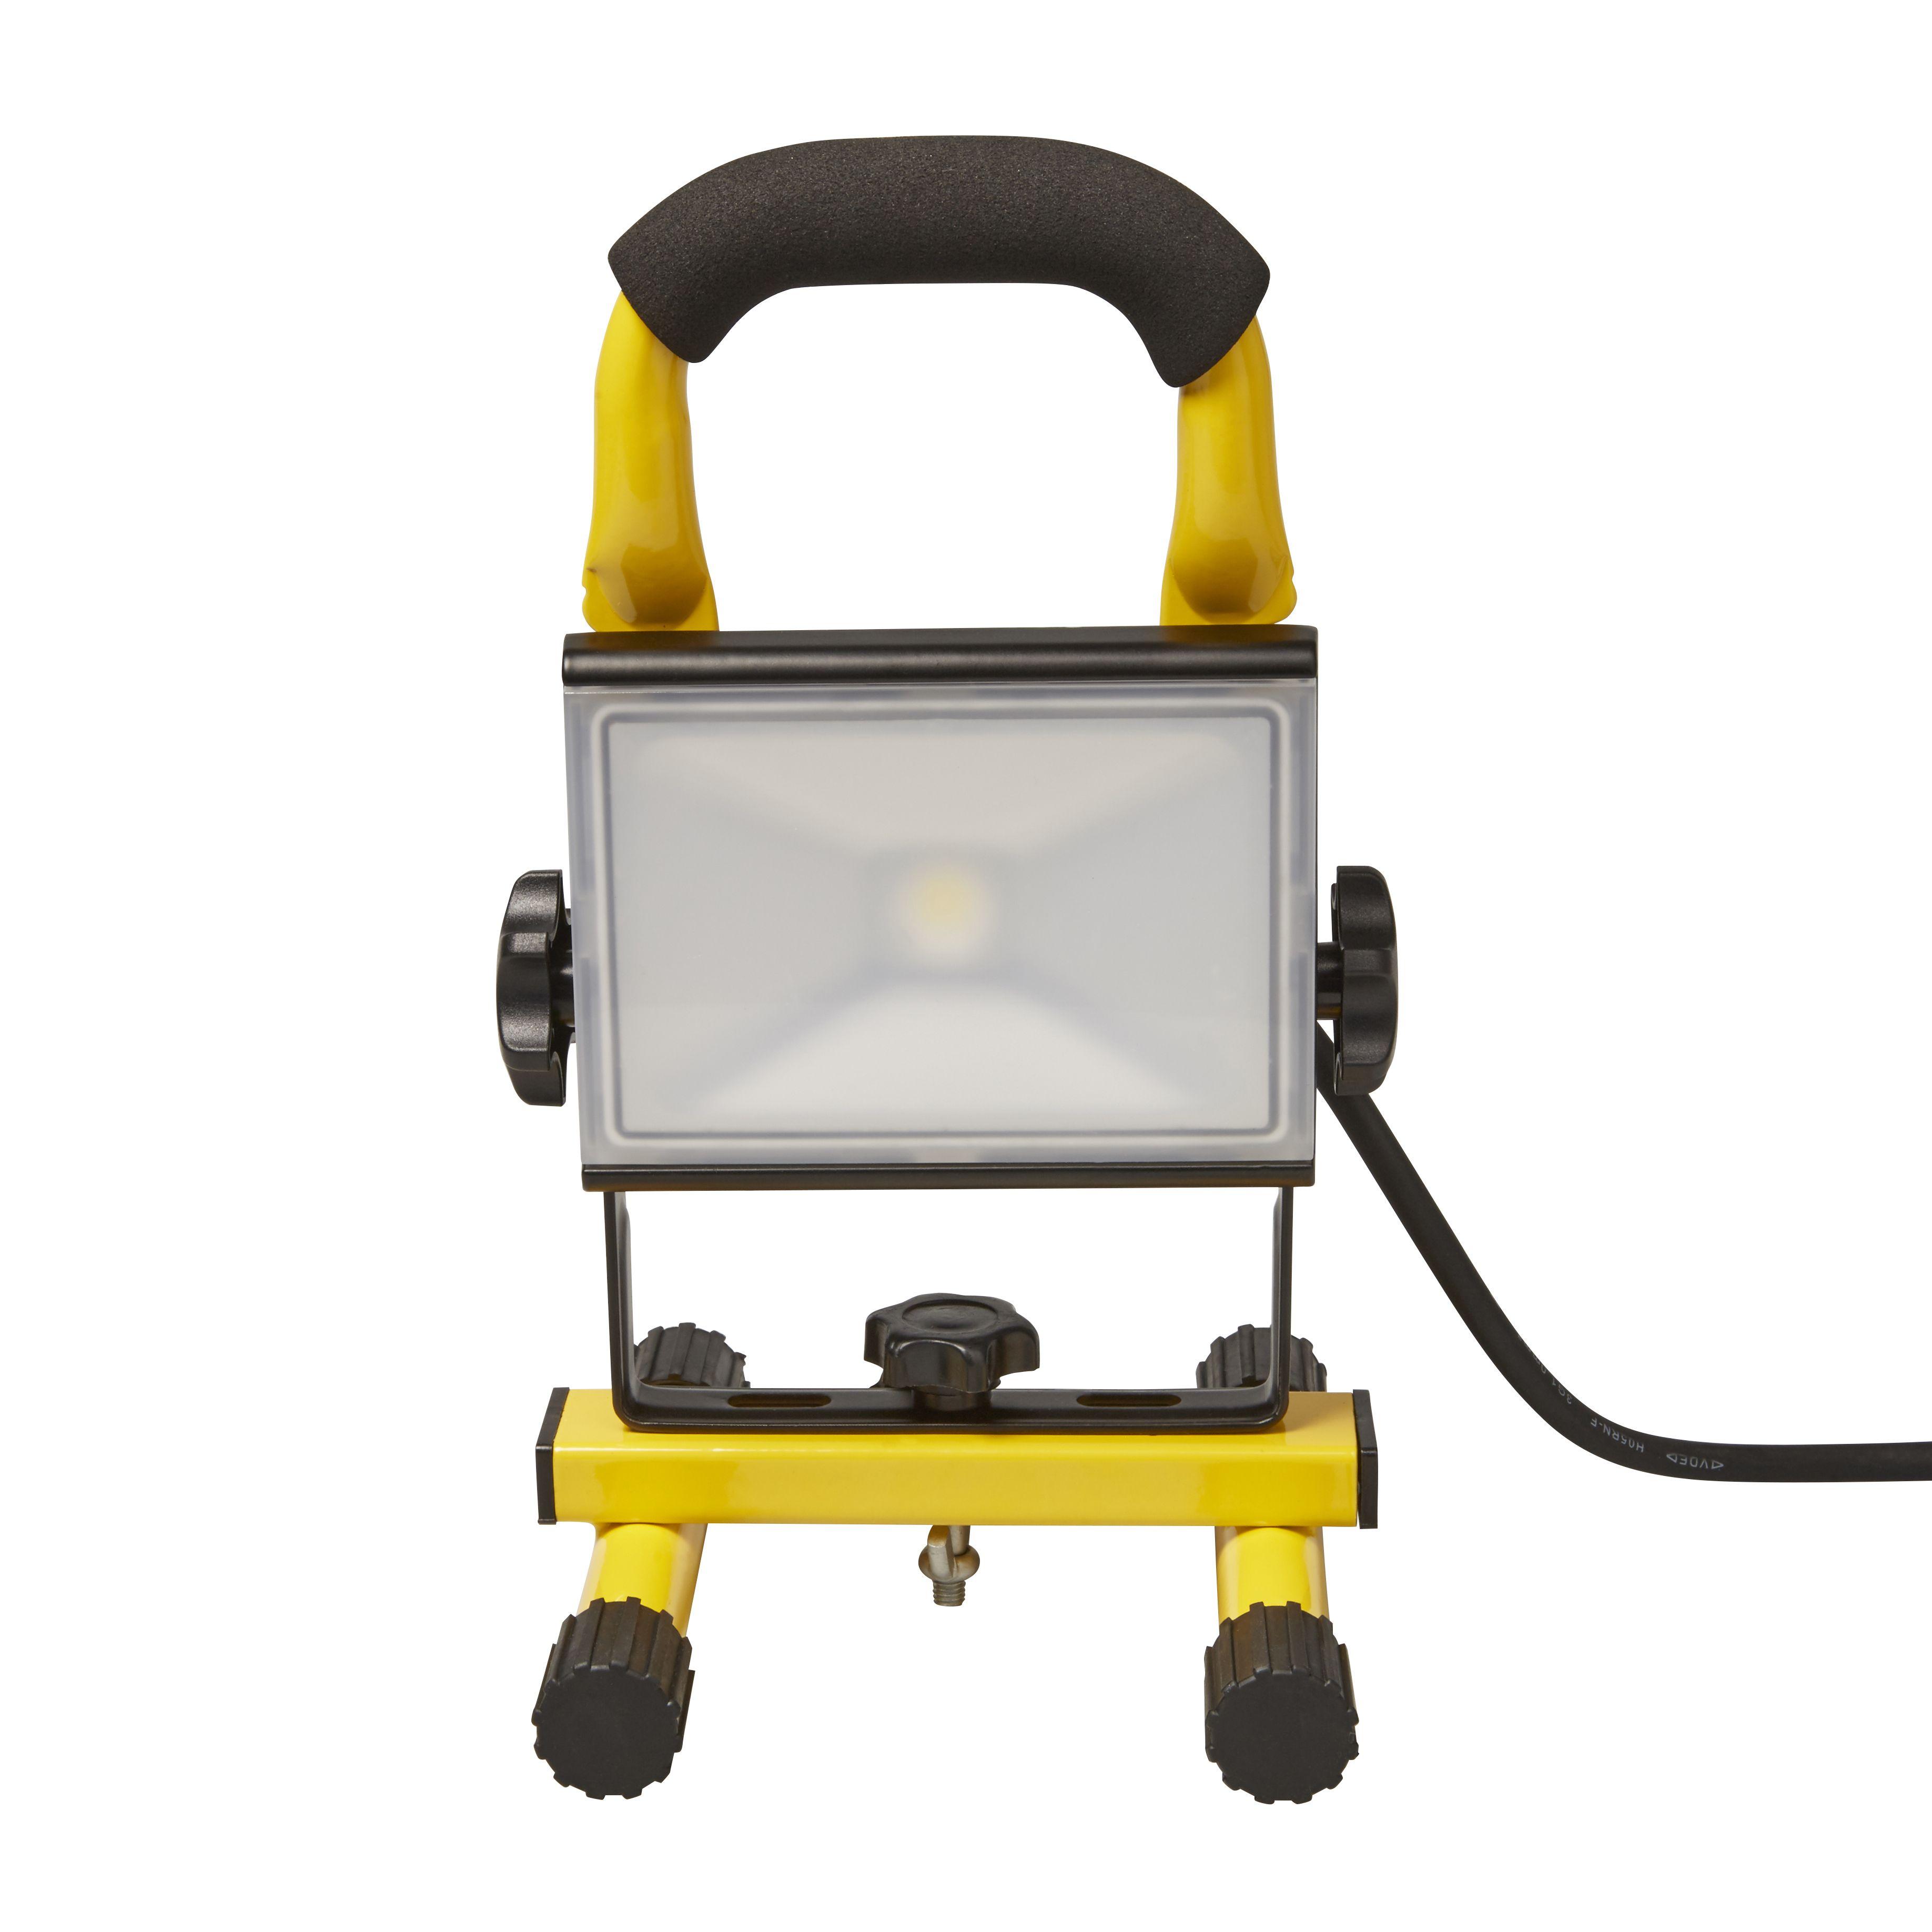 Diall Portable Work Light 11w 220-240 V